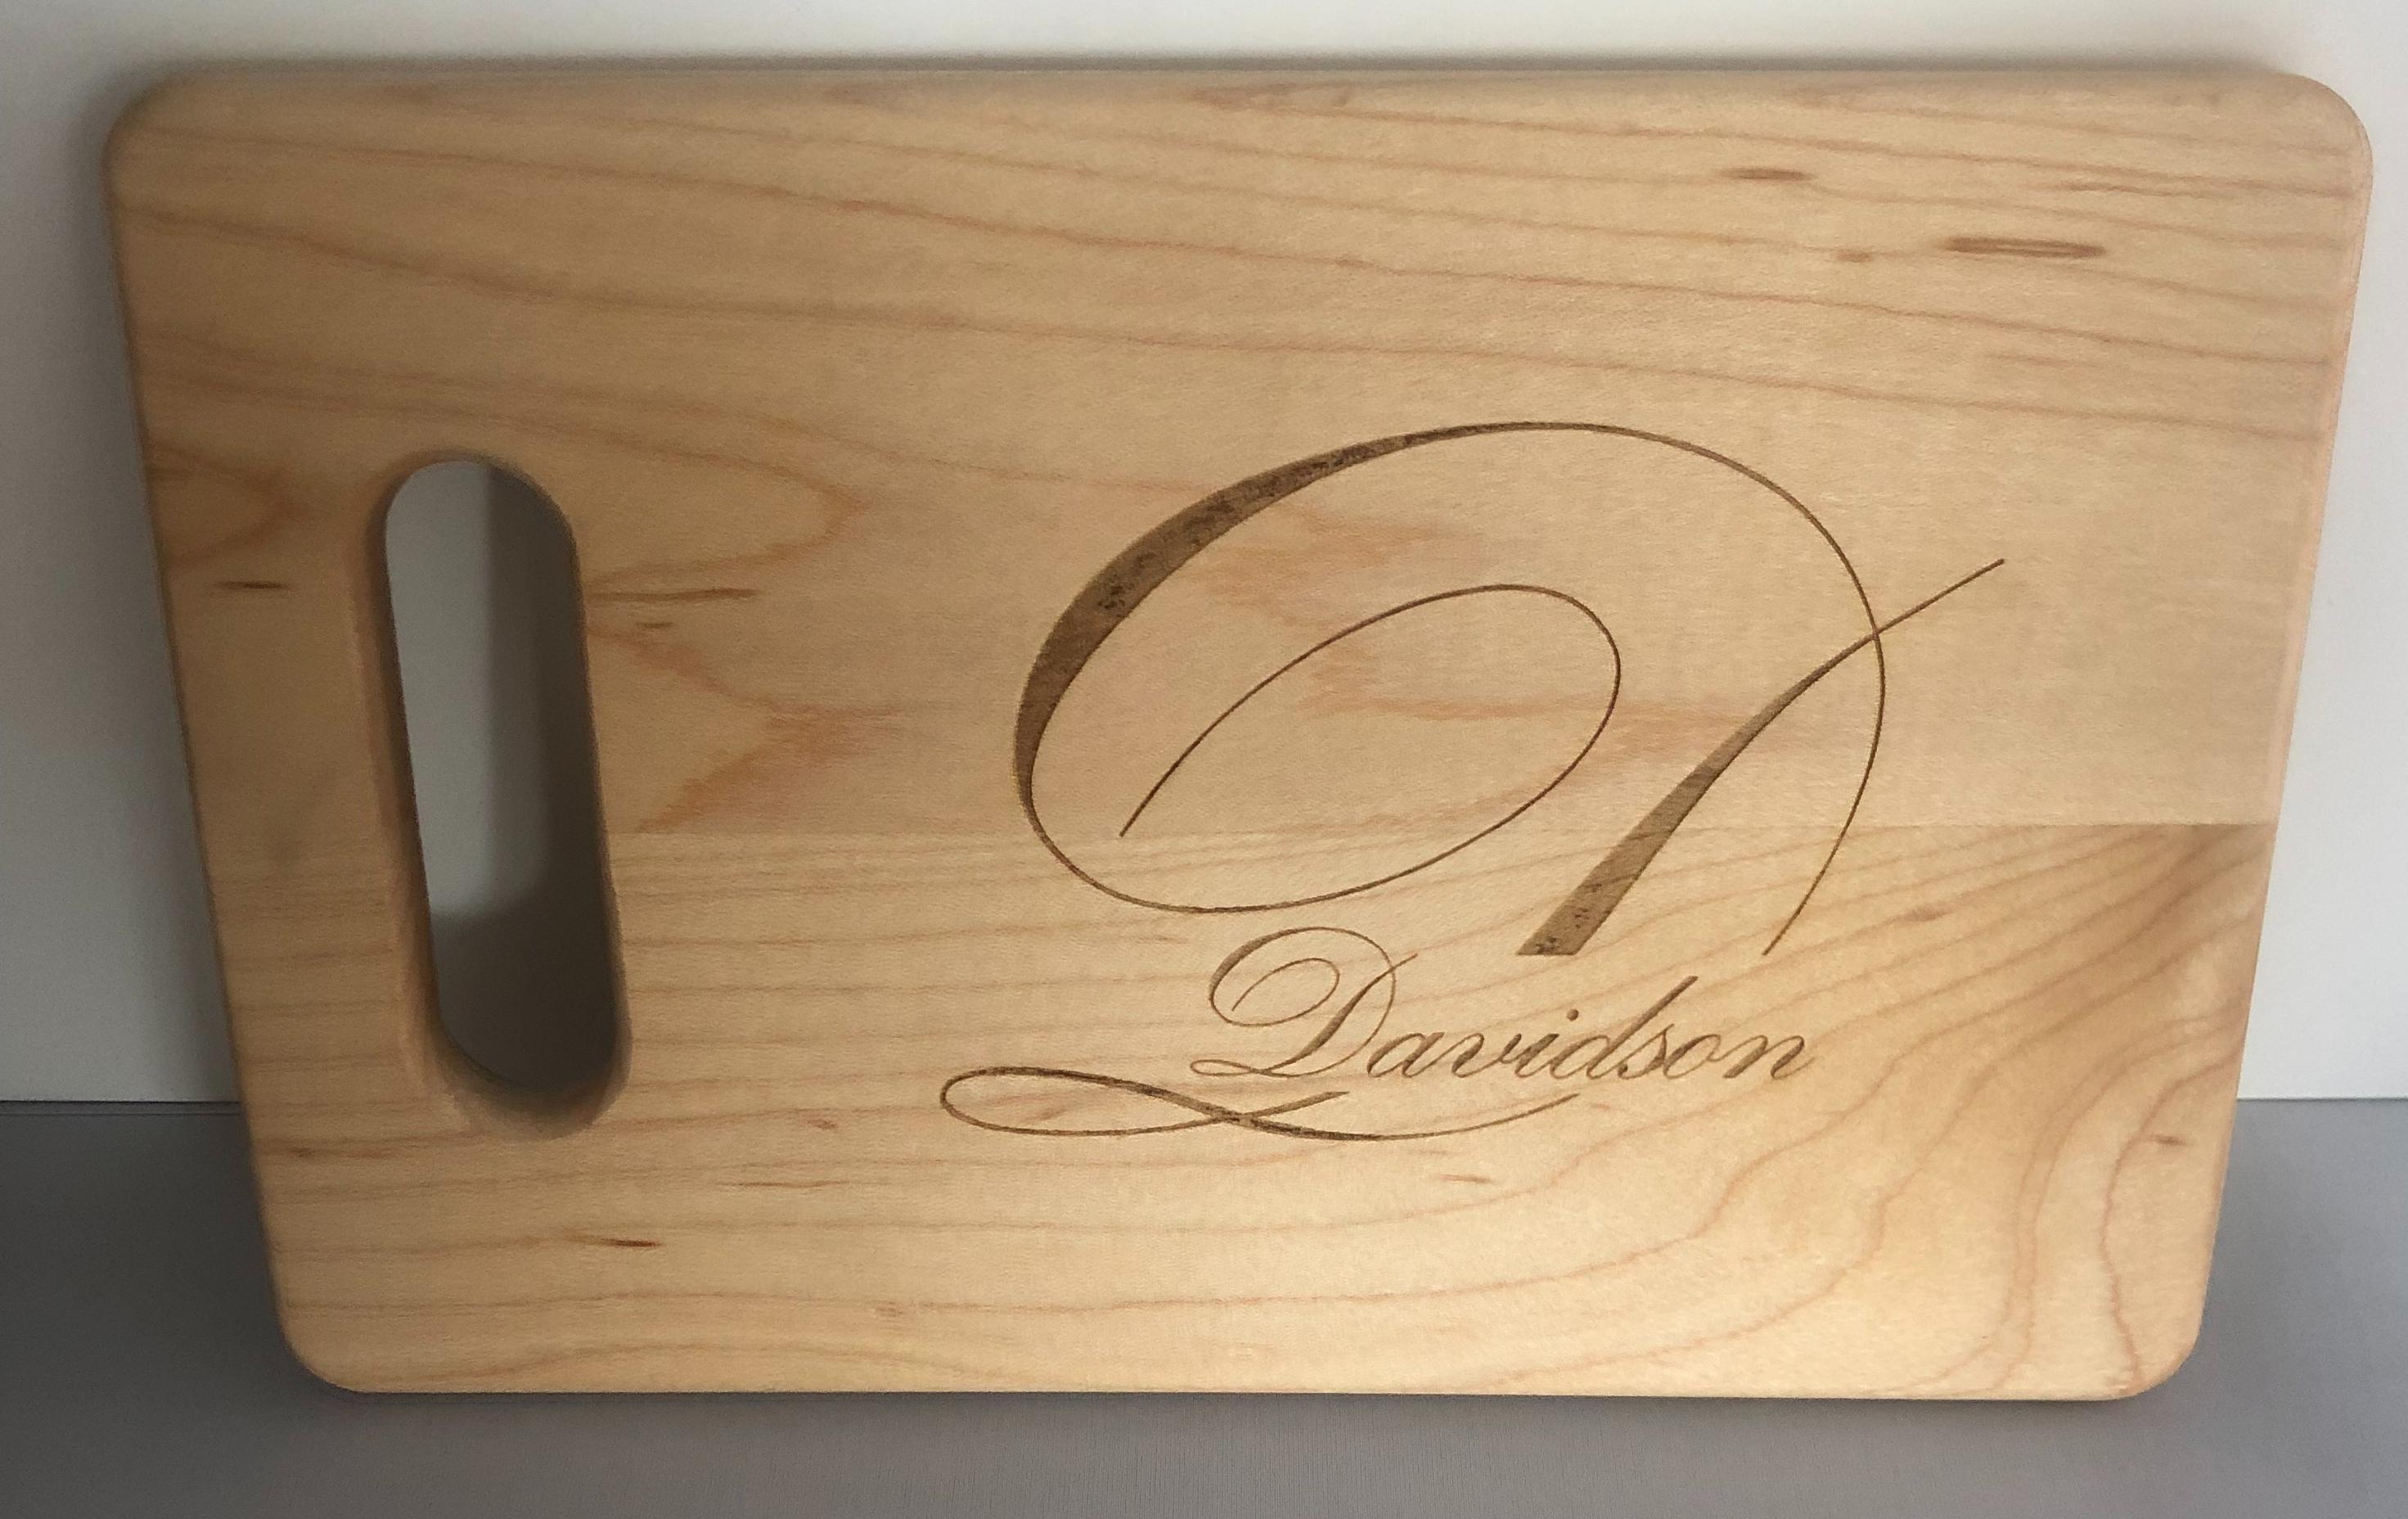 Walnut cstomized cutting board